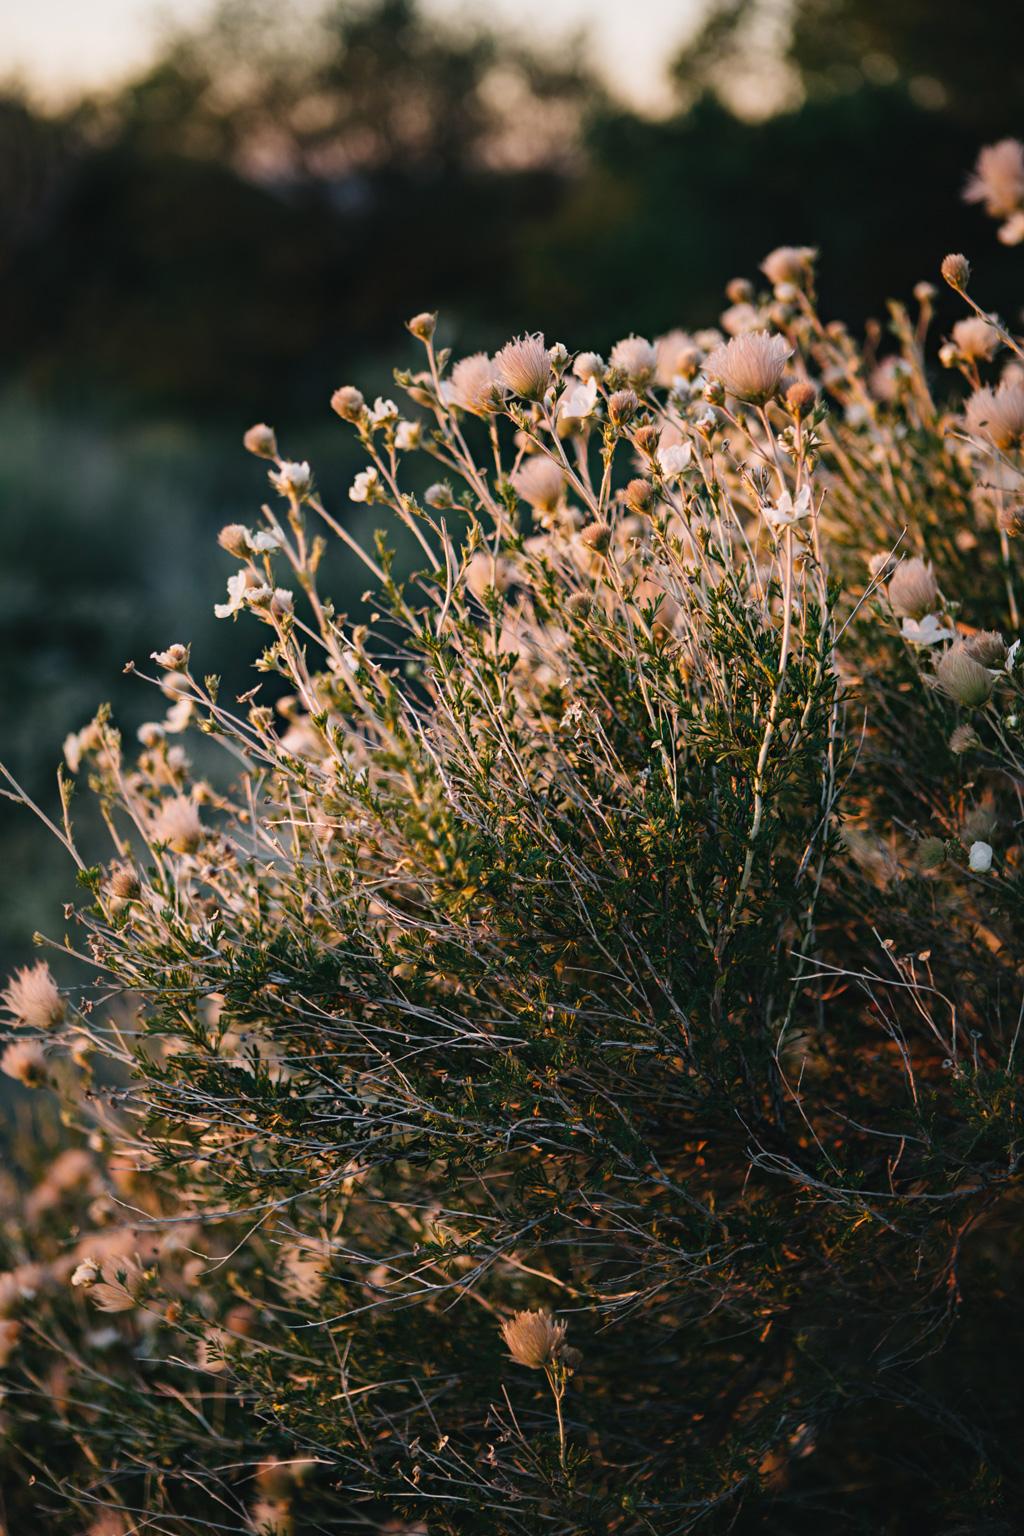 CindyGiovagnoli_Marfa_Texas_GuadalupeMountainsNationalPark_CarlsbadCavern_morning_hike-026.jpg